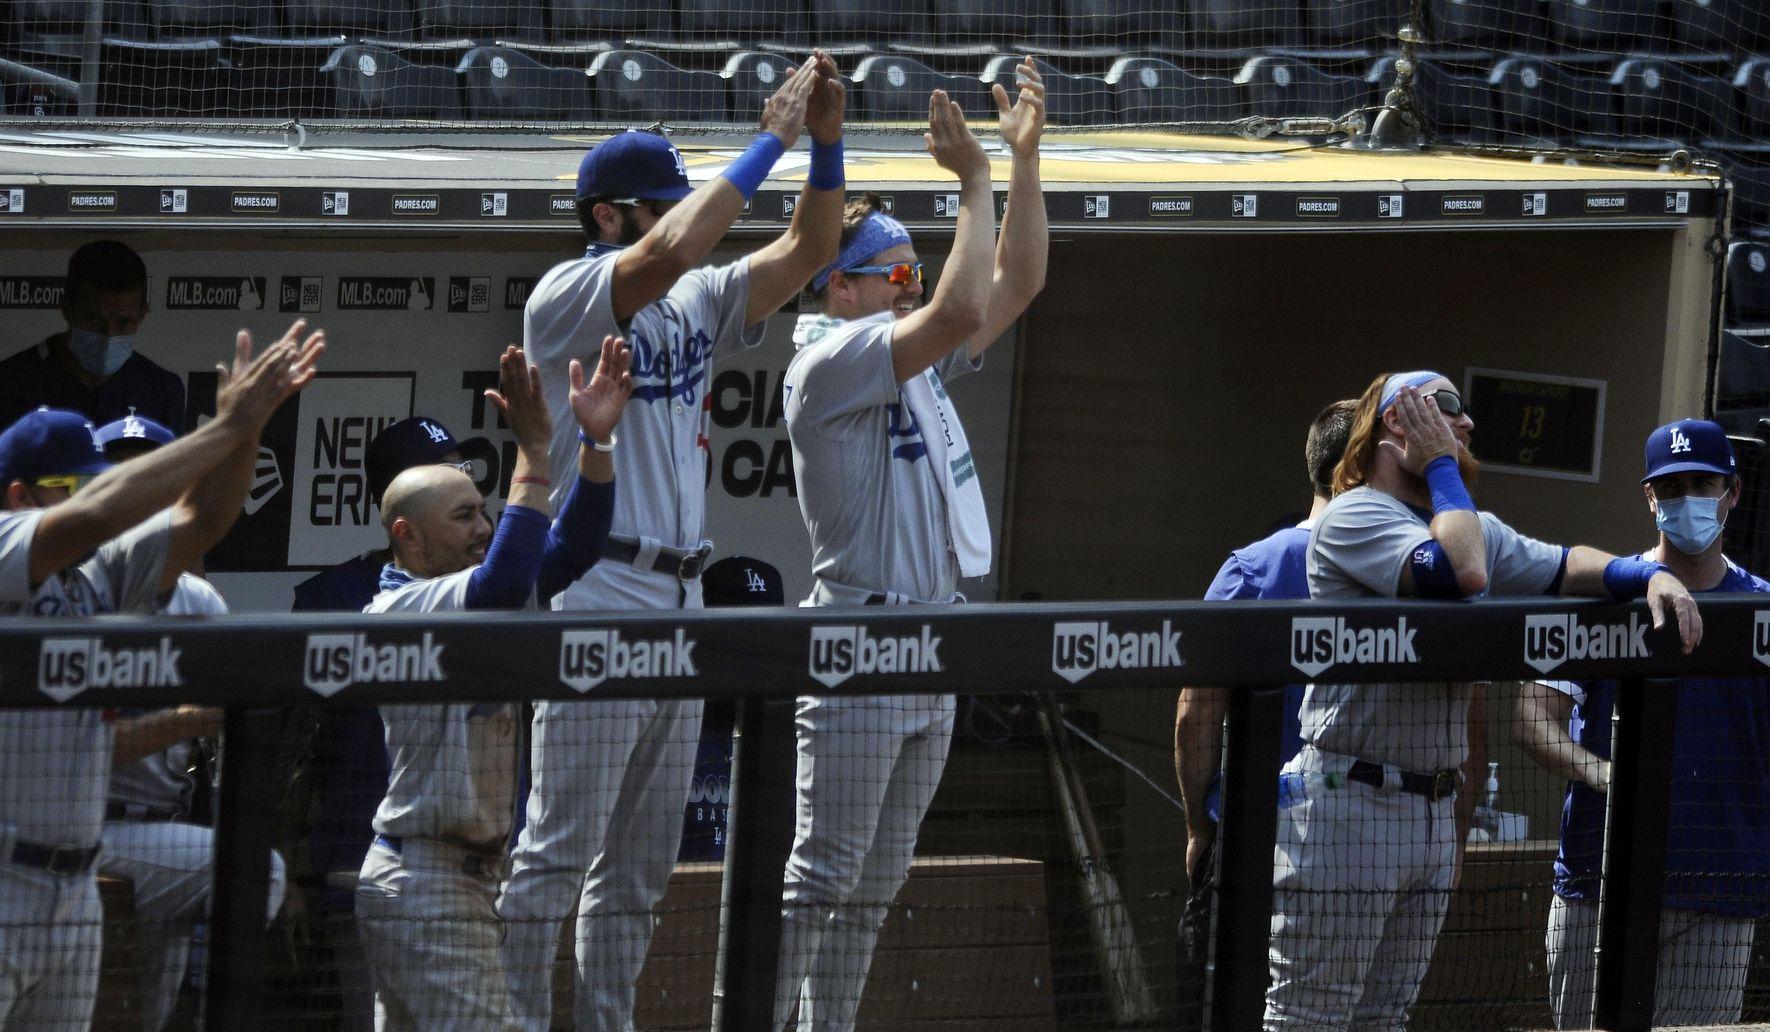 Dodgers_padres_baseball_54110_c0-167-4002-2500_s1770x1032